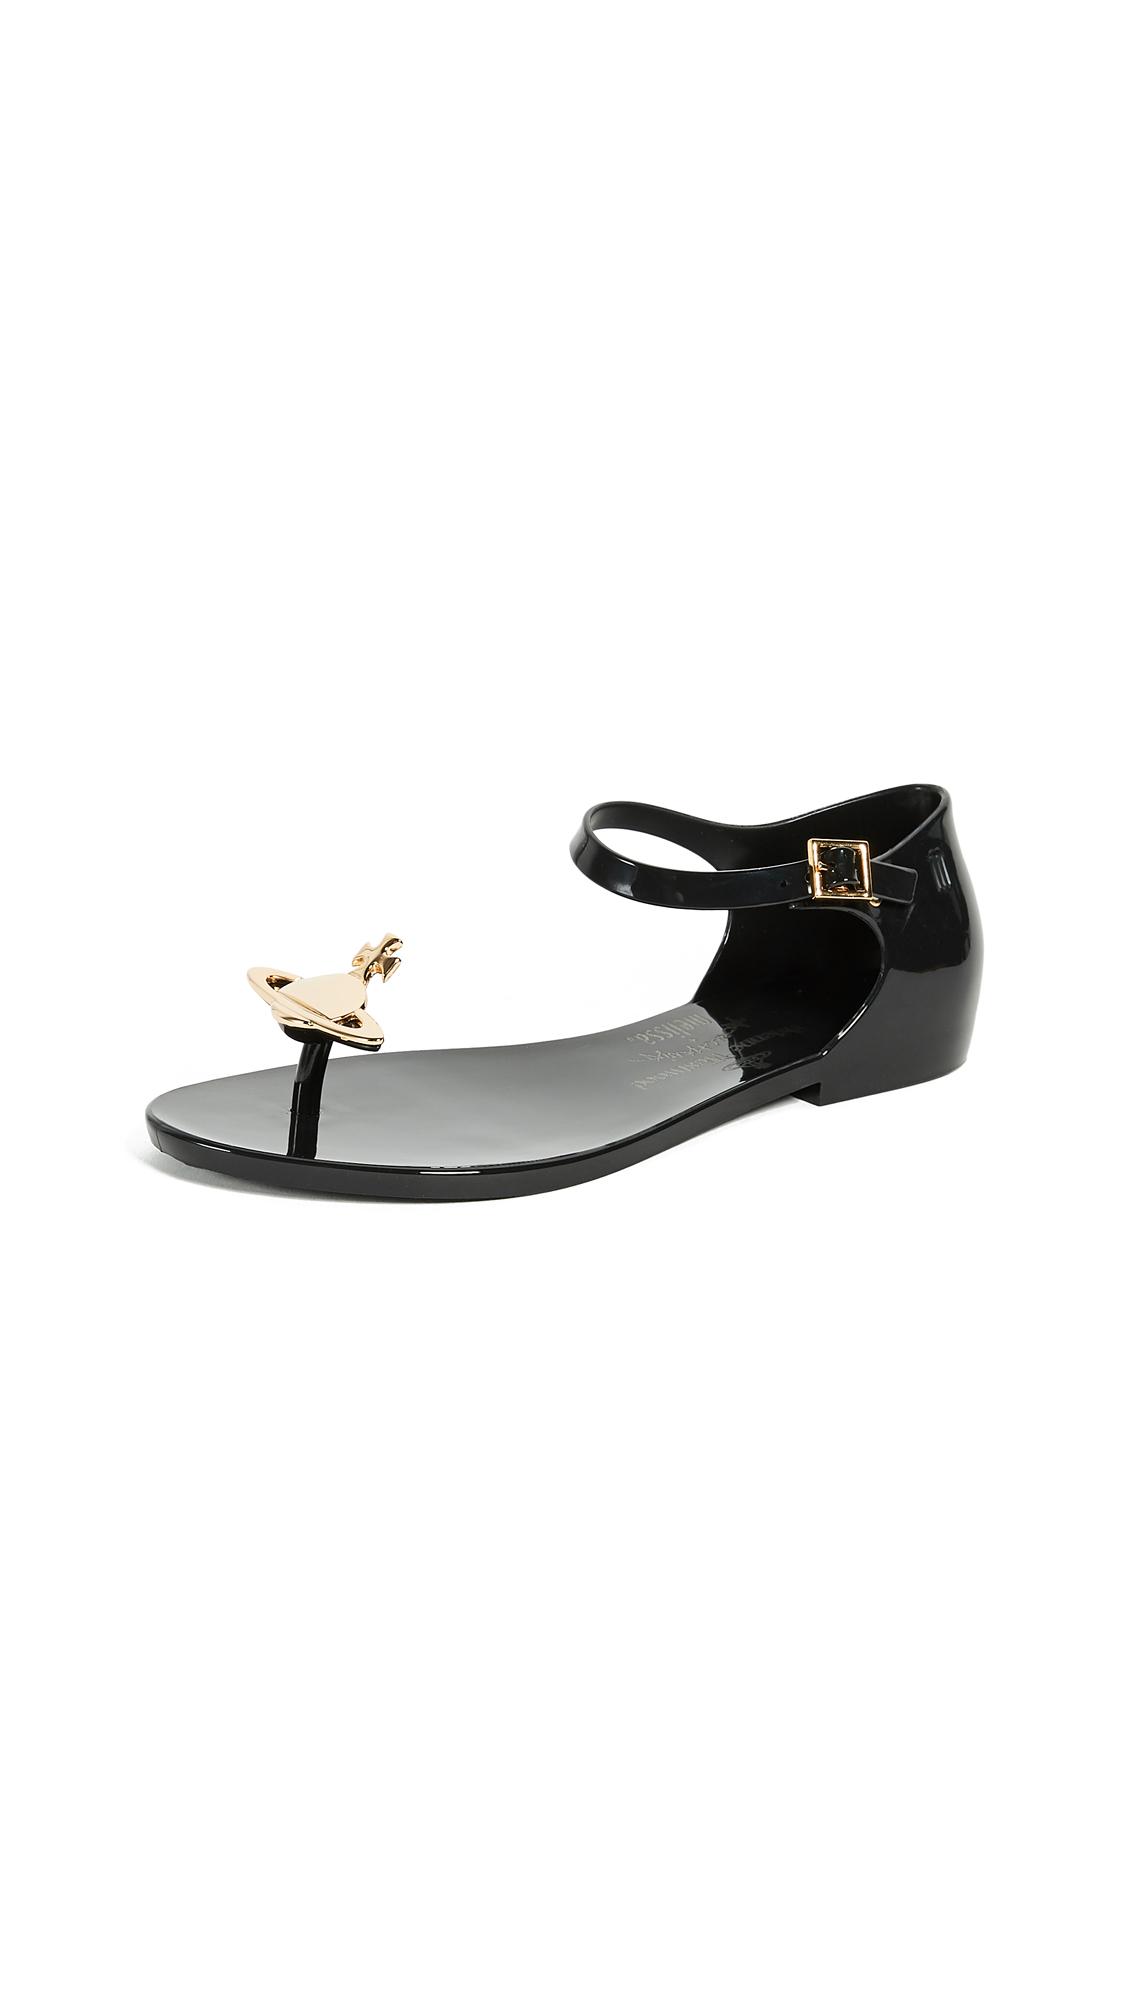 Melissa x Vivienne Westwood Honey Sandals - Black Gold